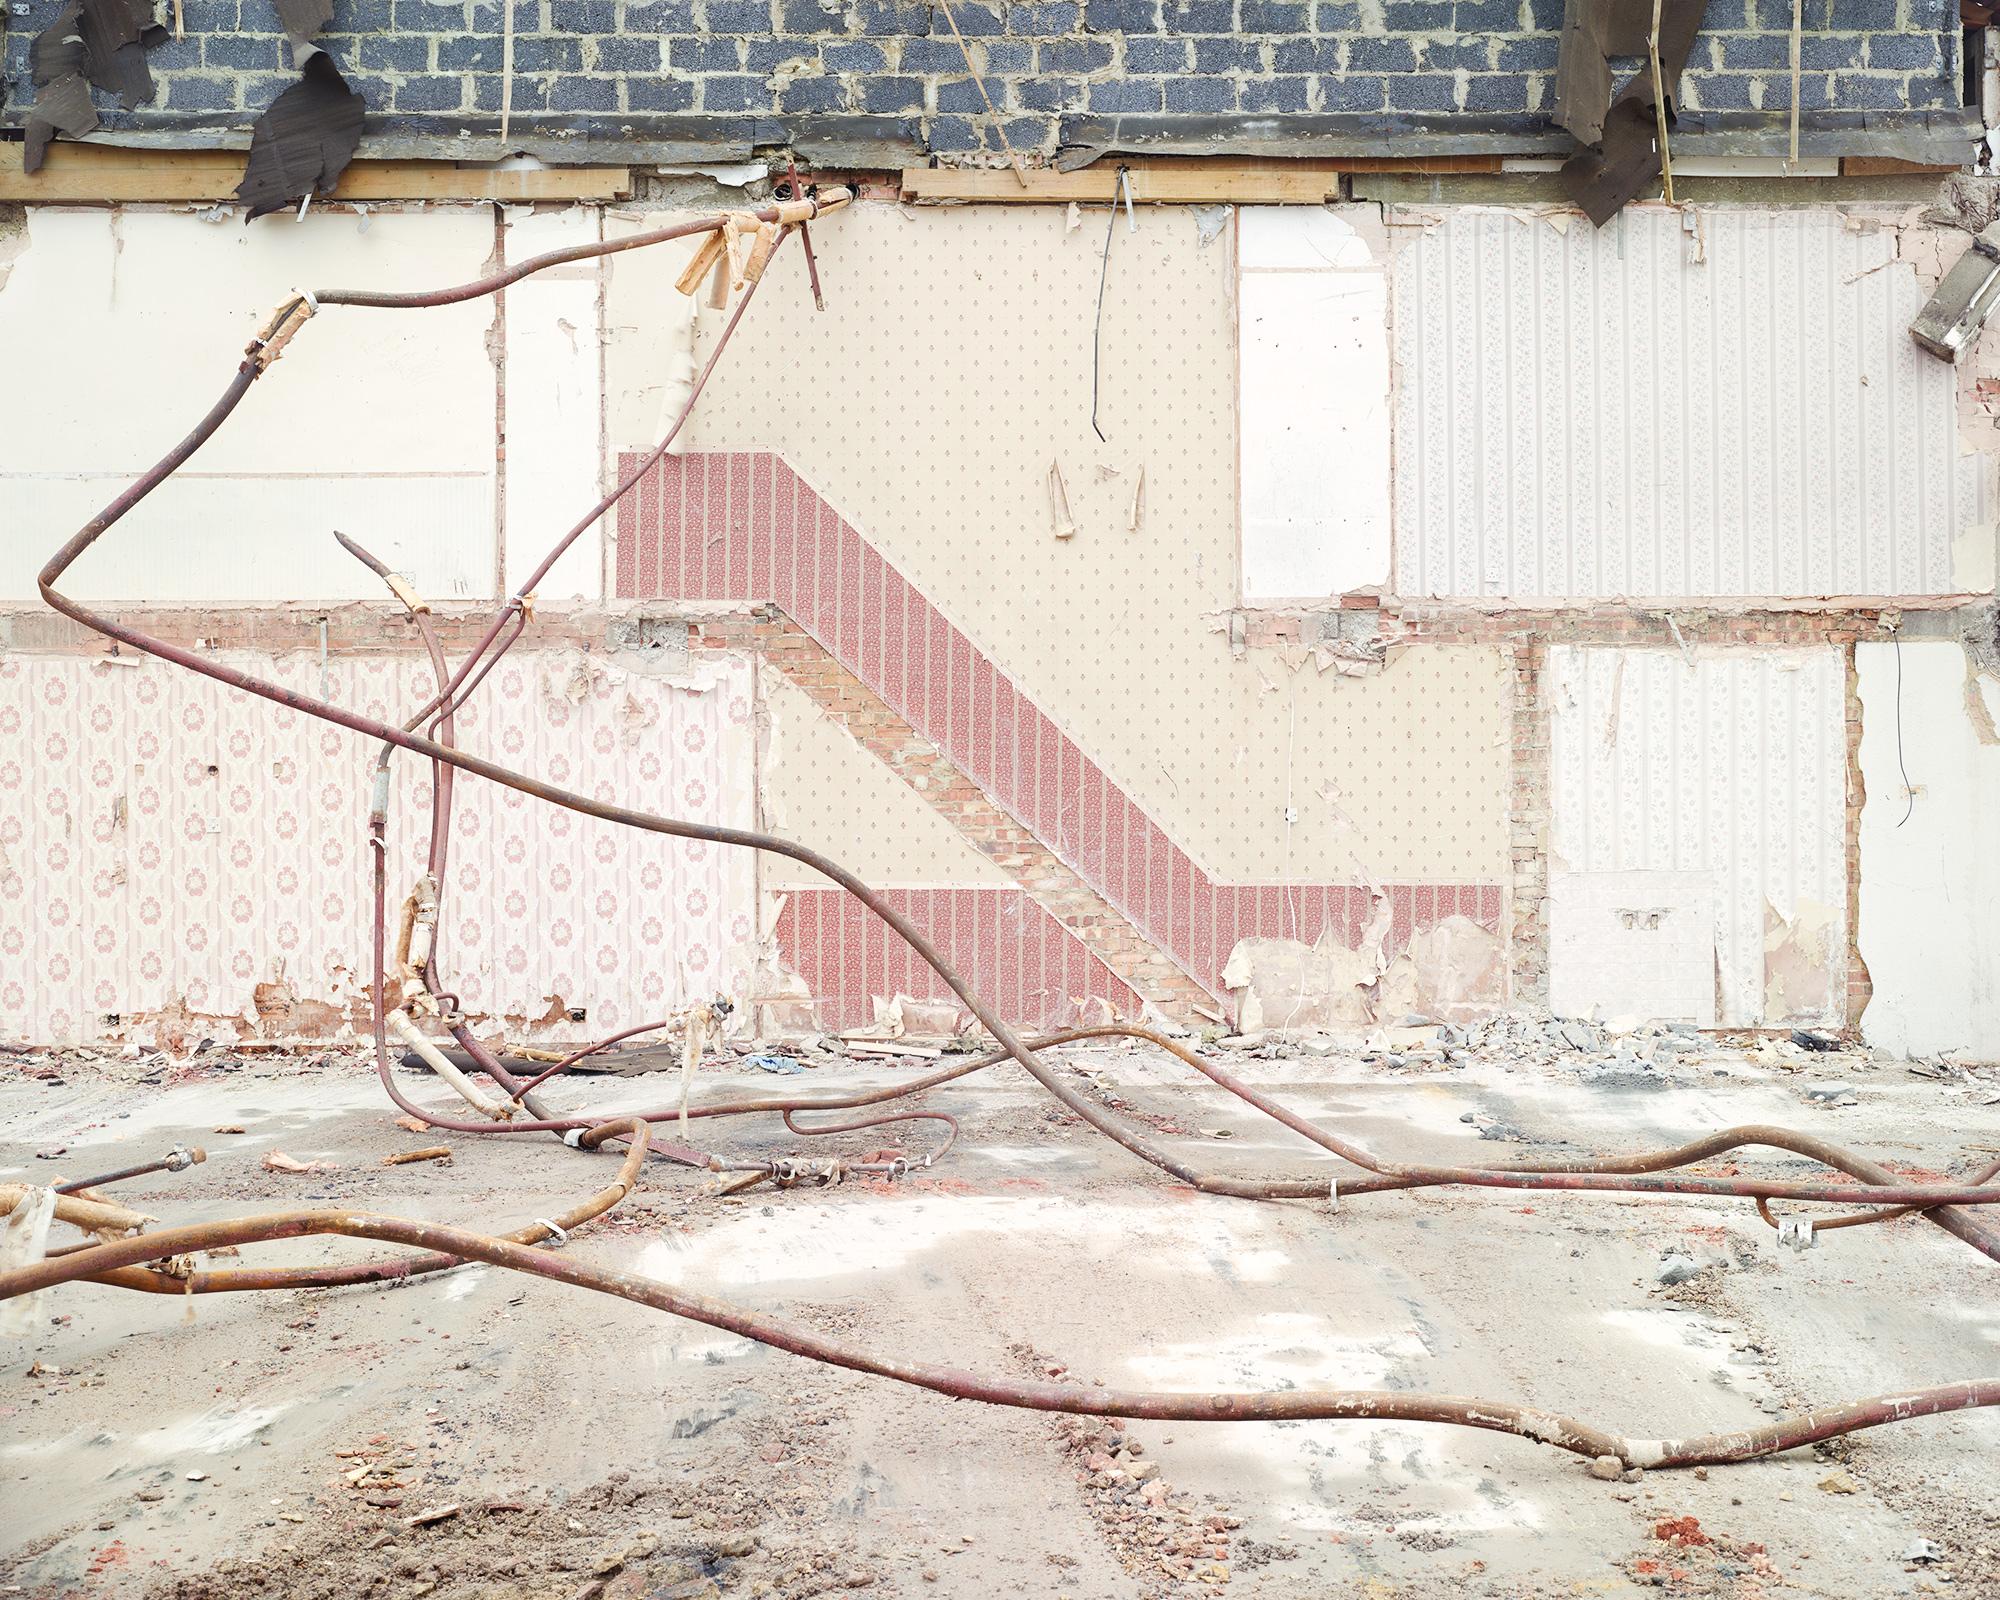 Demolition of Ferrier Estate, Kidbrooke Park Road, London, 2012. C-Type print, 80cm x 100cm © Alan McFetridge